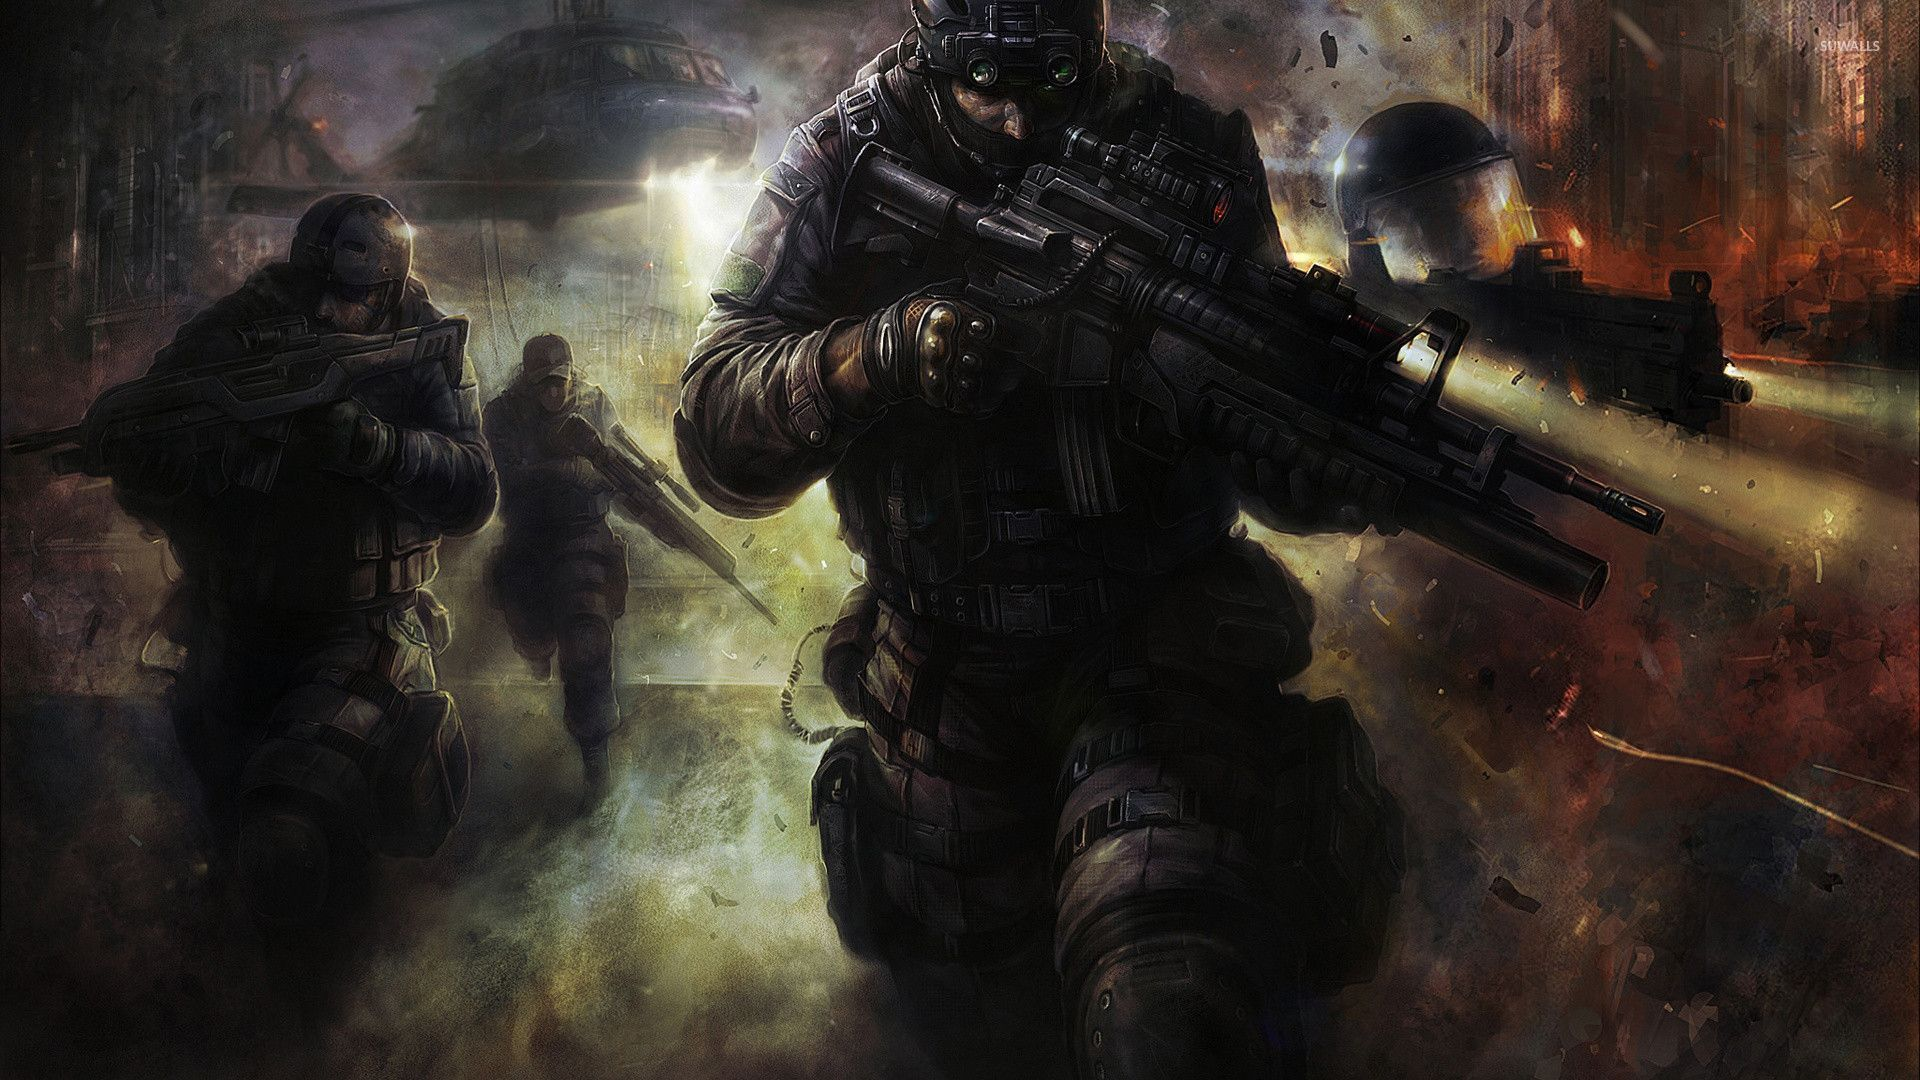 SWAT team wallpaper   Fantasy wallpapers   29720 1920x1080